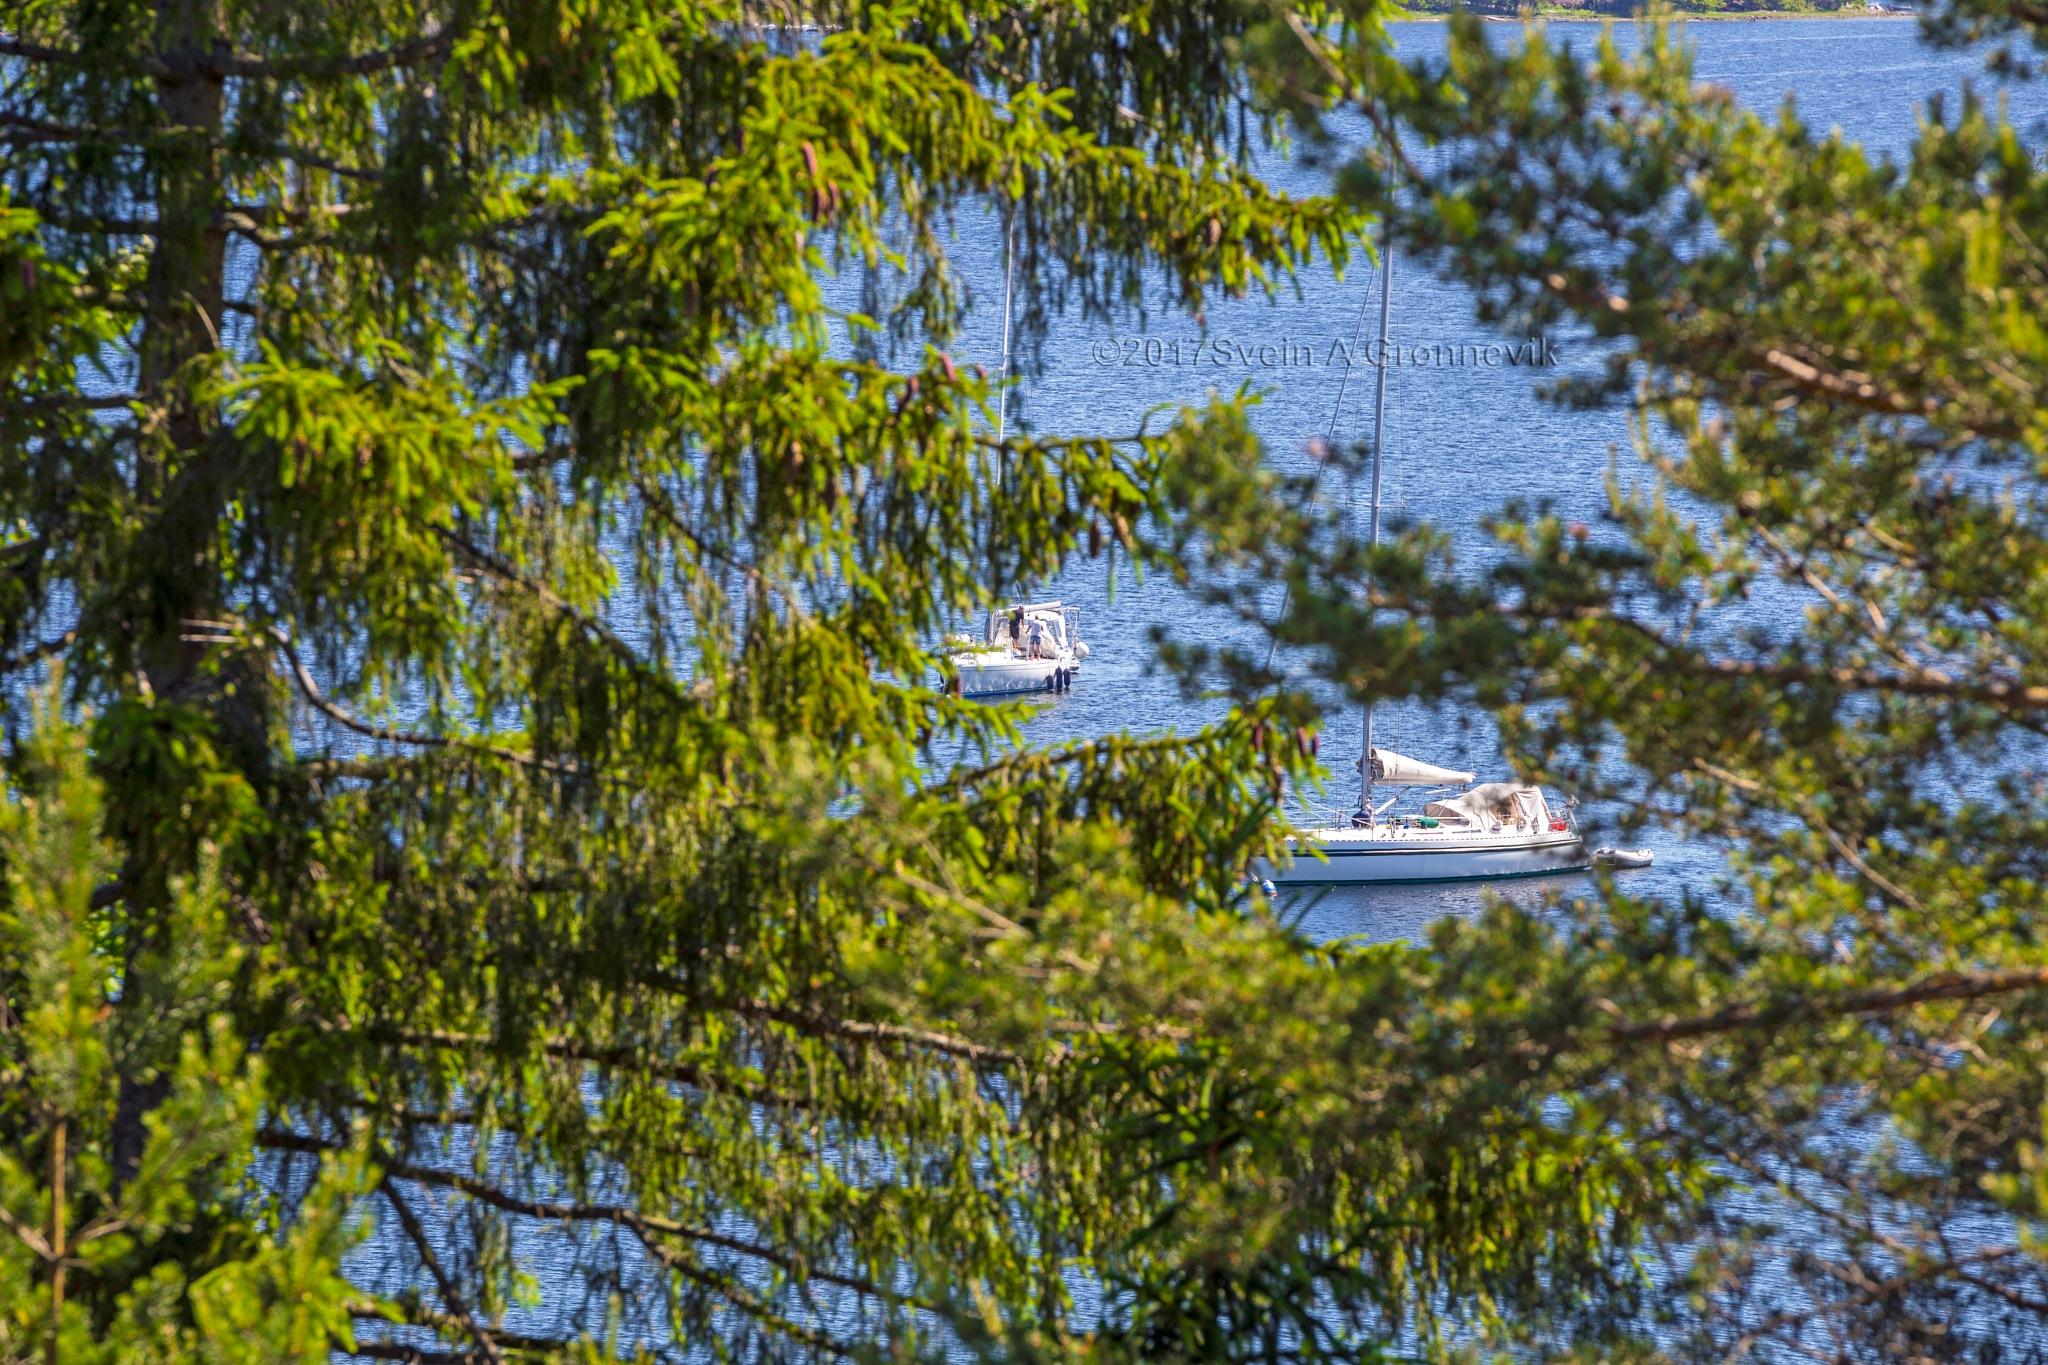 Saiboats In The Trees... by Svein Arne Grønnevik